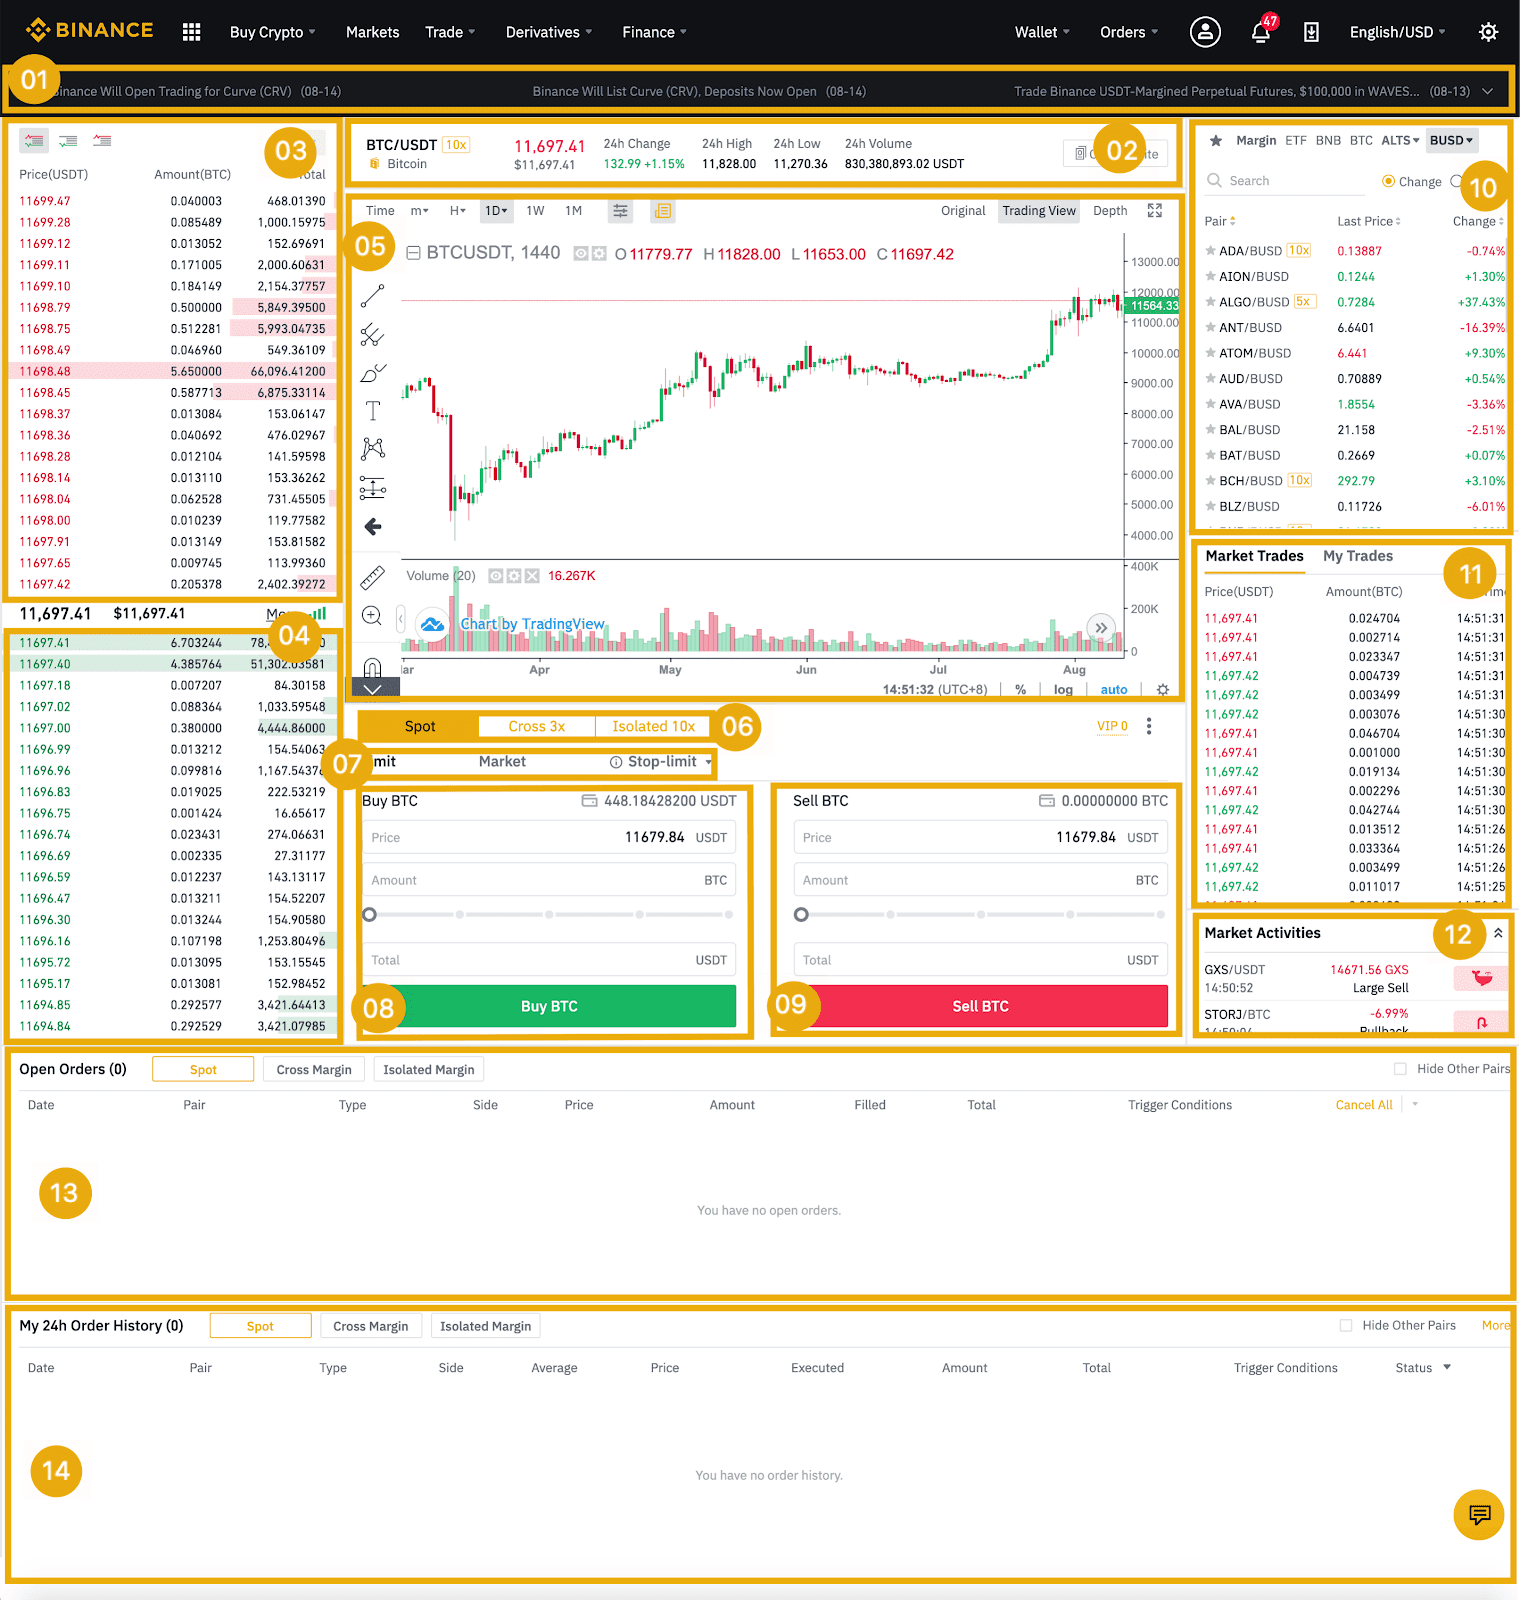 LTCBTC — Grafico prezzo Litecoin / Bitcoin — TradingView